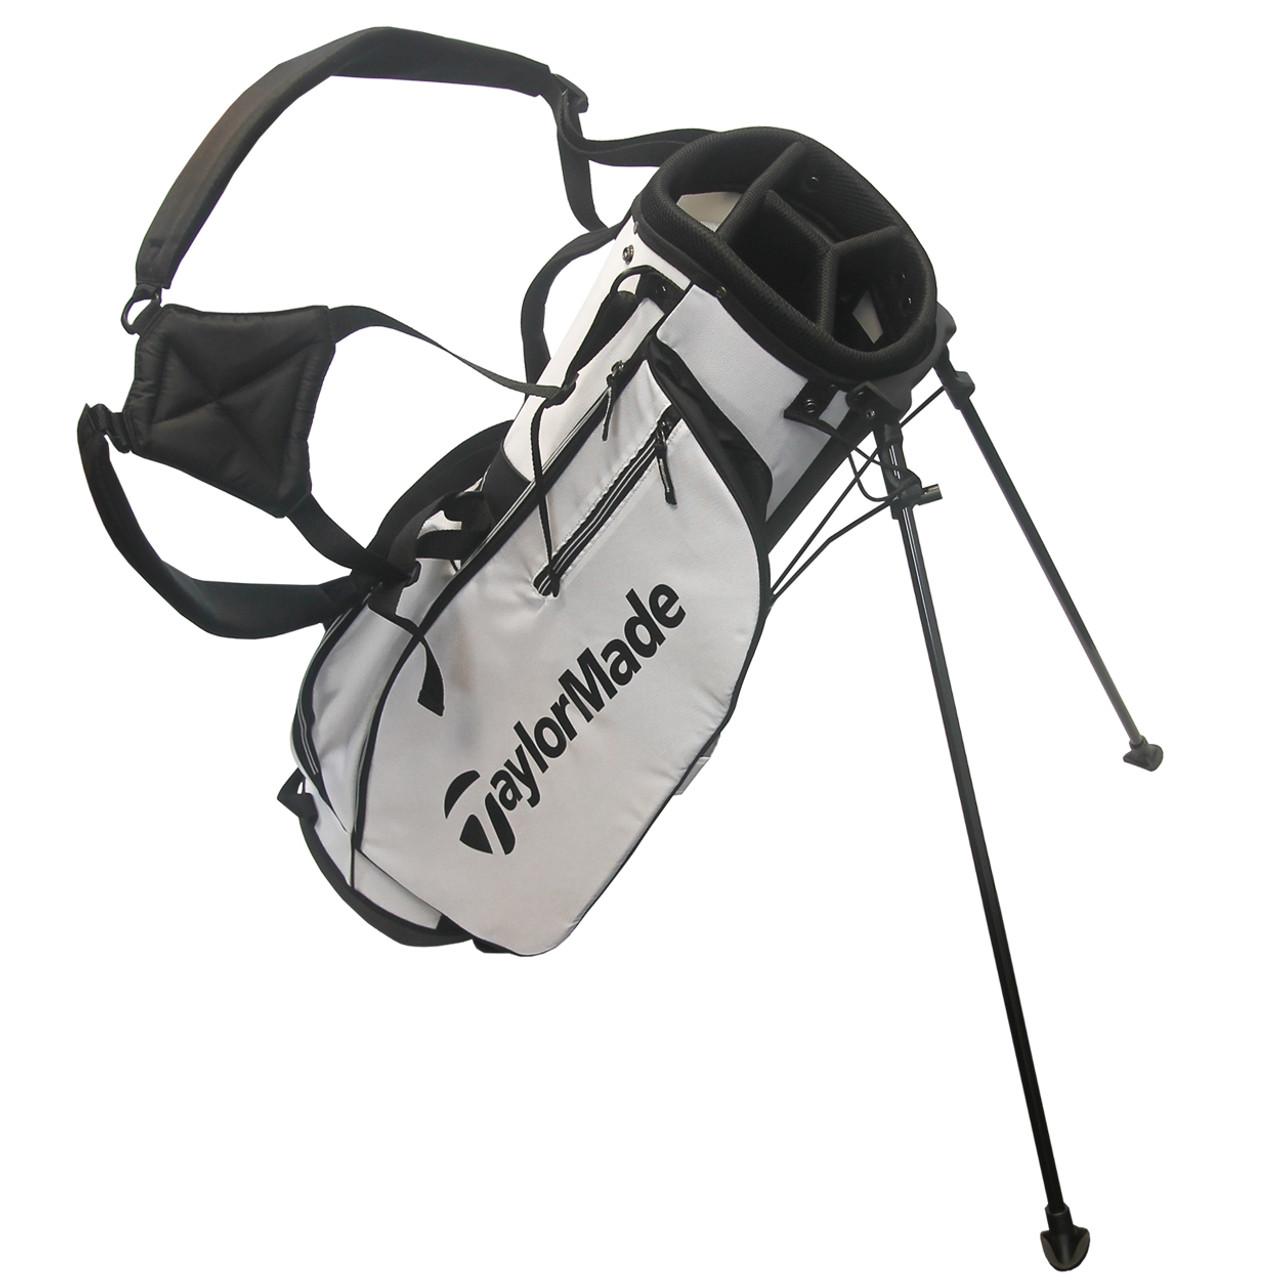 Taylormade Golf Bag >> Taylormade Golf Stand Bag 5 0